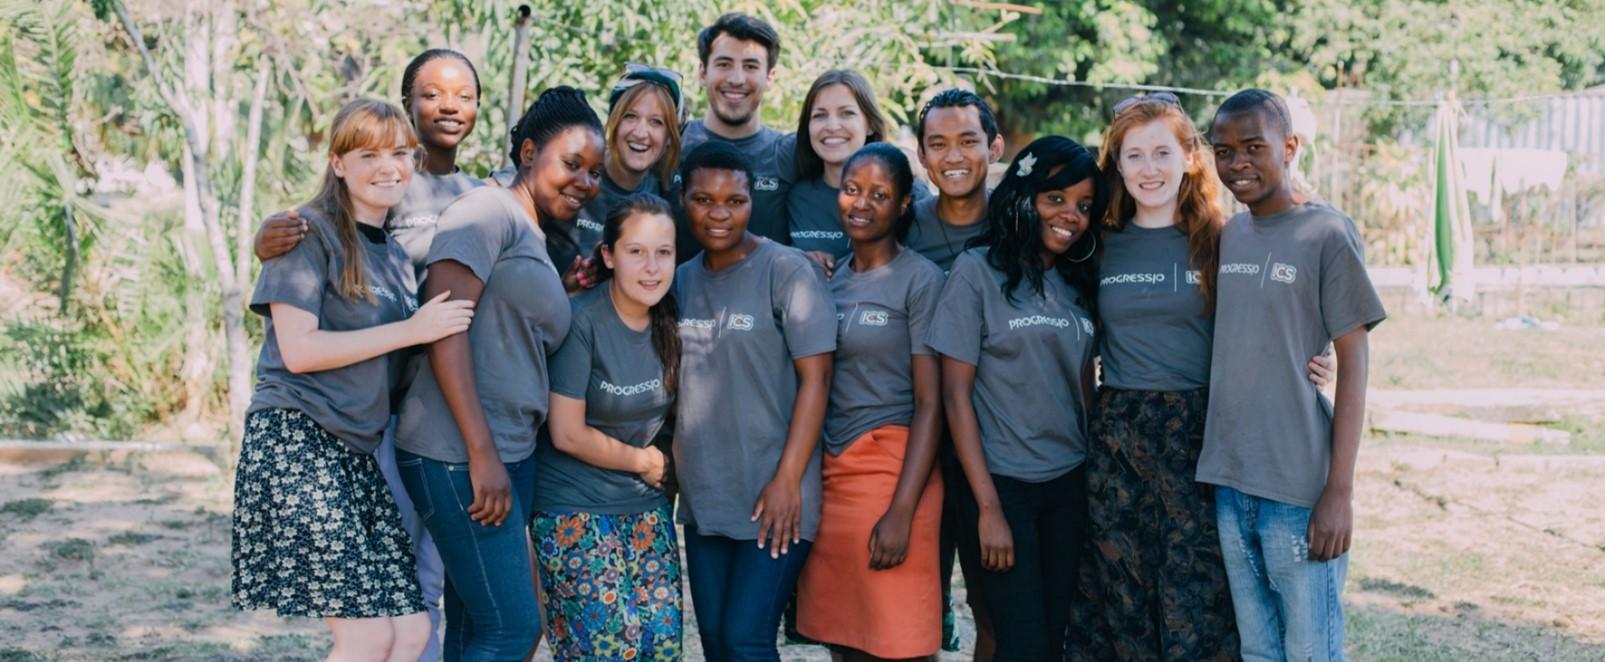 Maria with her Progressio ICS volunteer team in Zimbabwe